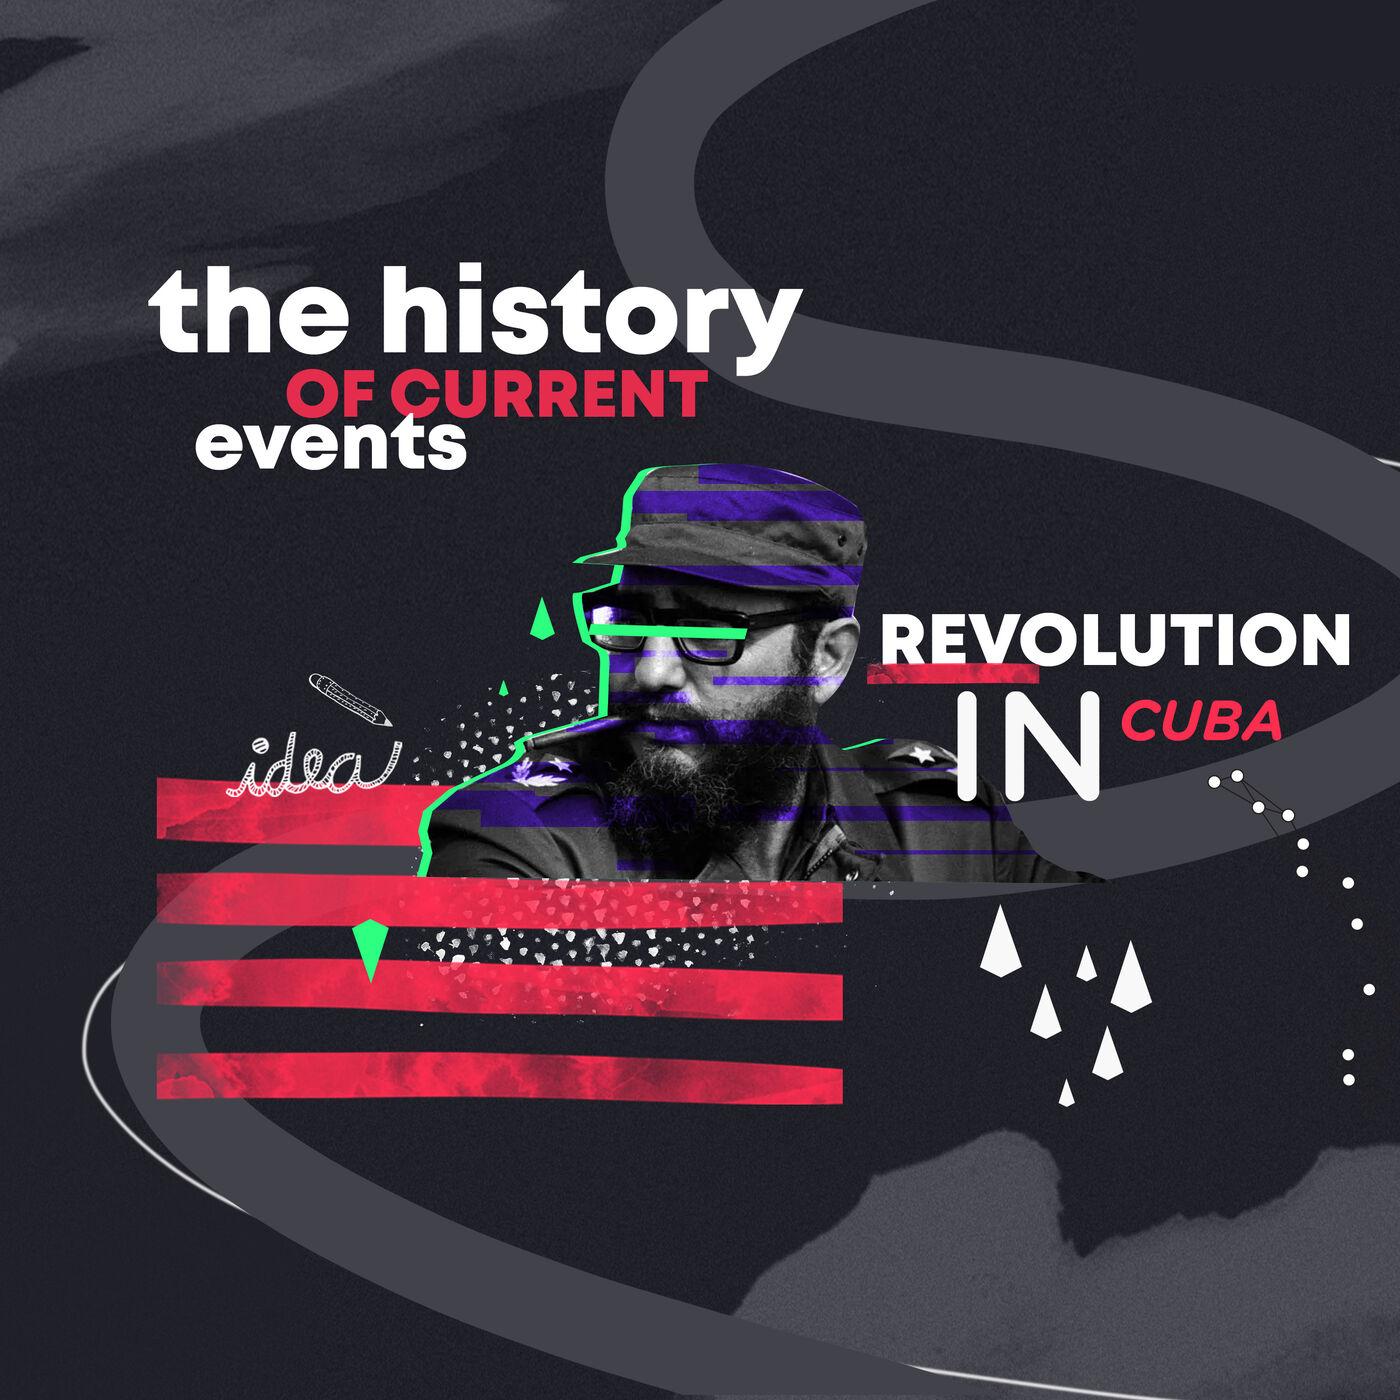 Revolution in Cuba